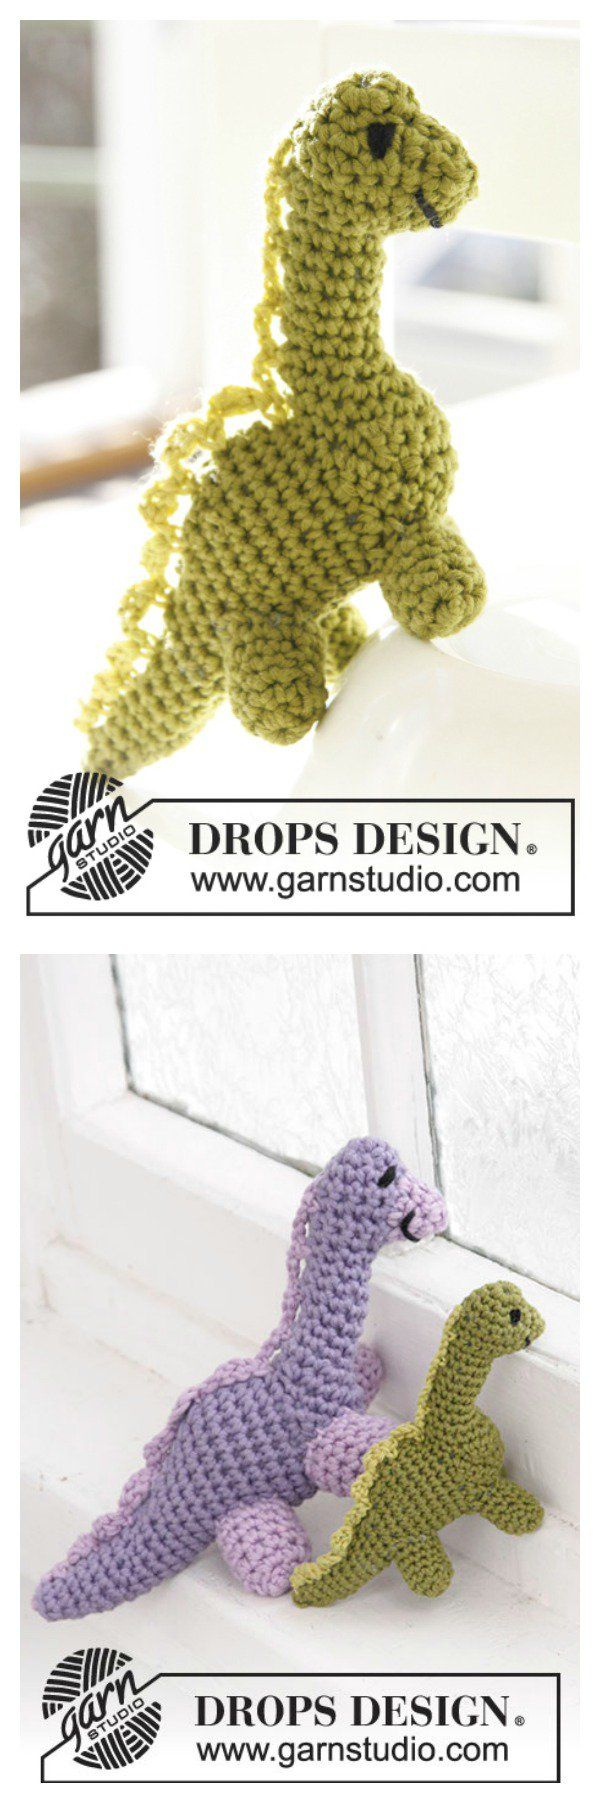 Crochet Amigurumi Collection : 2028 best Crocheted animals images on Pinterest